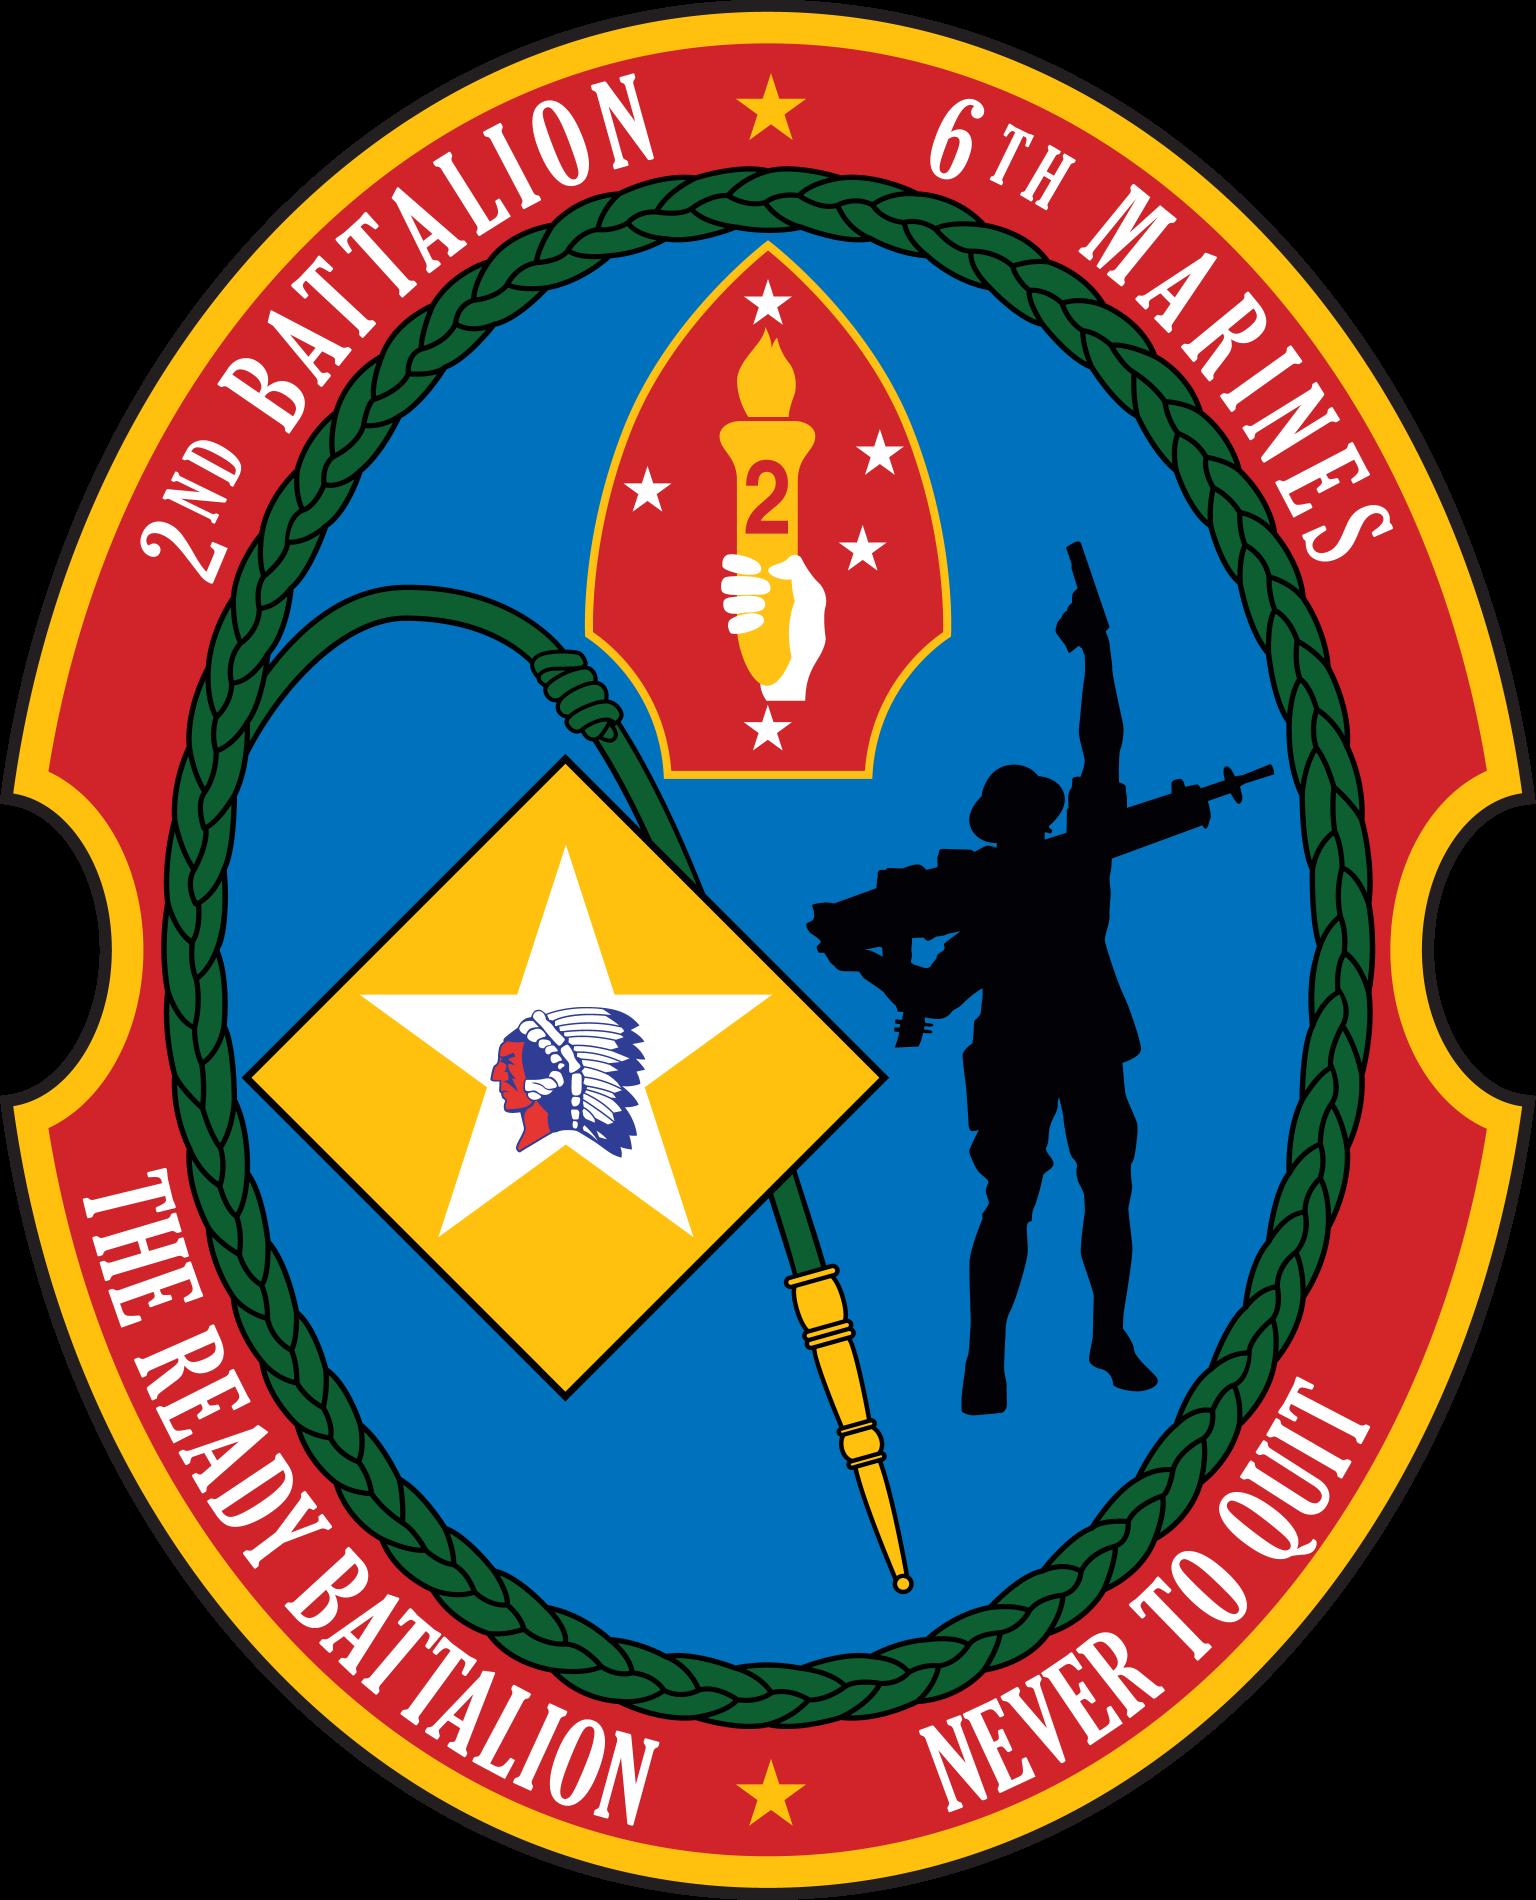 2nd Battalion 6th Marine Regiment of United States